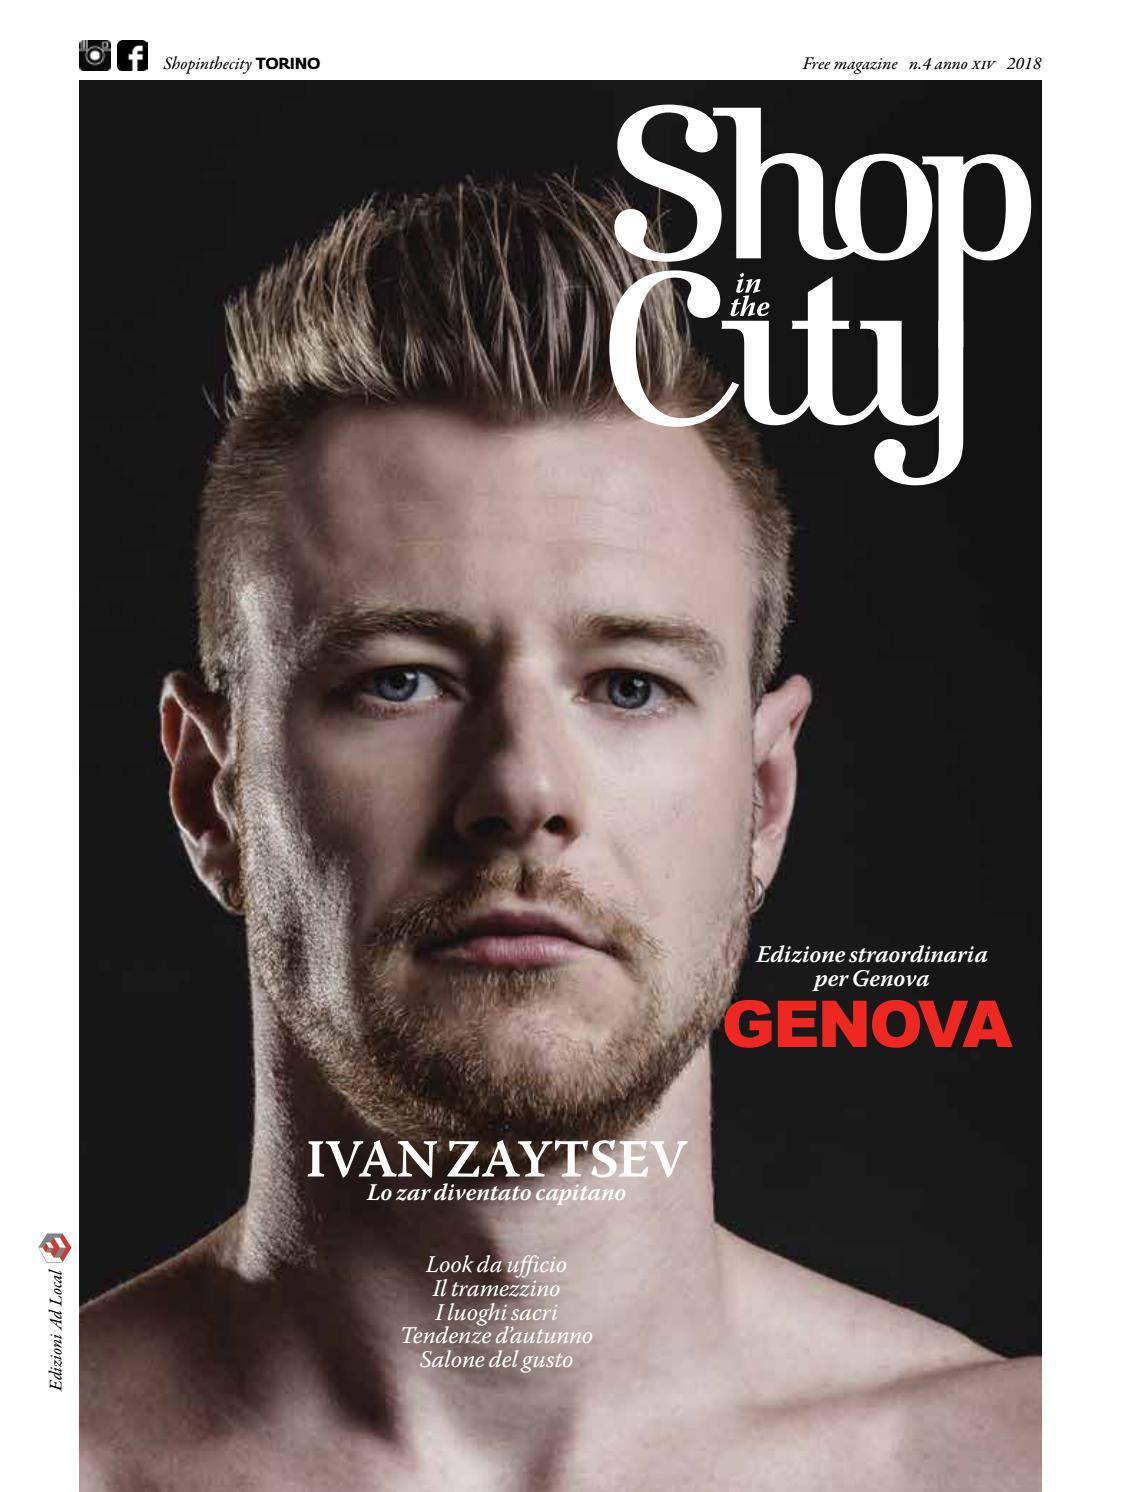 ShopintheCity Torino 2018 by ShopintheCity - issuu 2bd30bde0d8